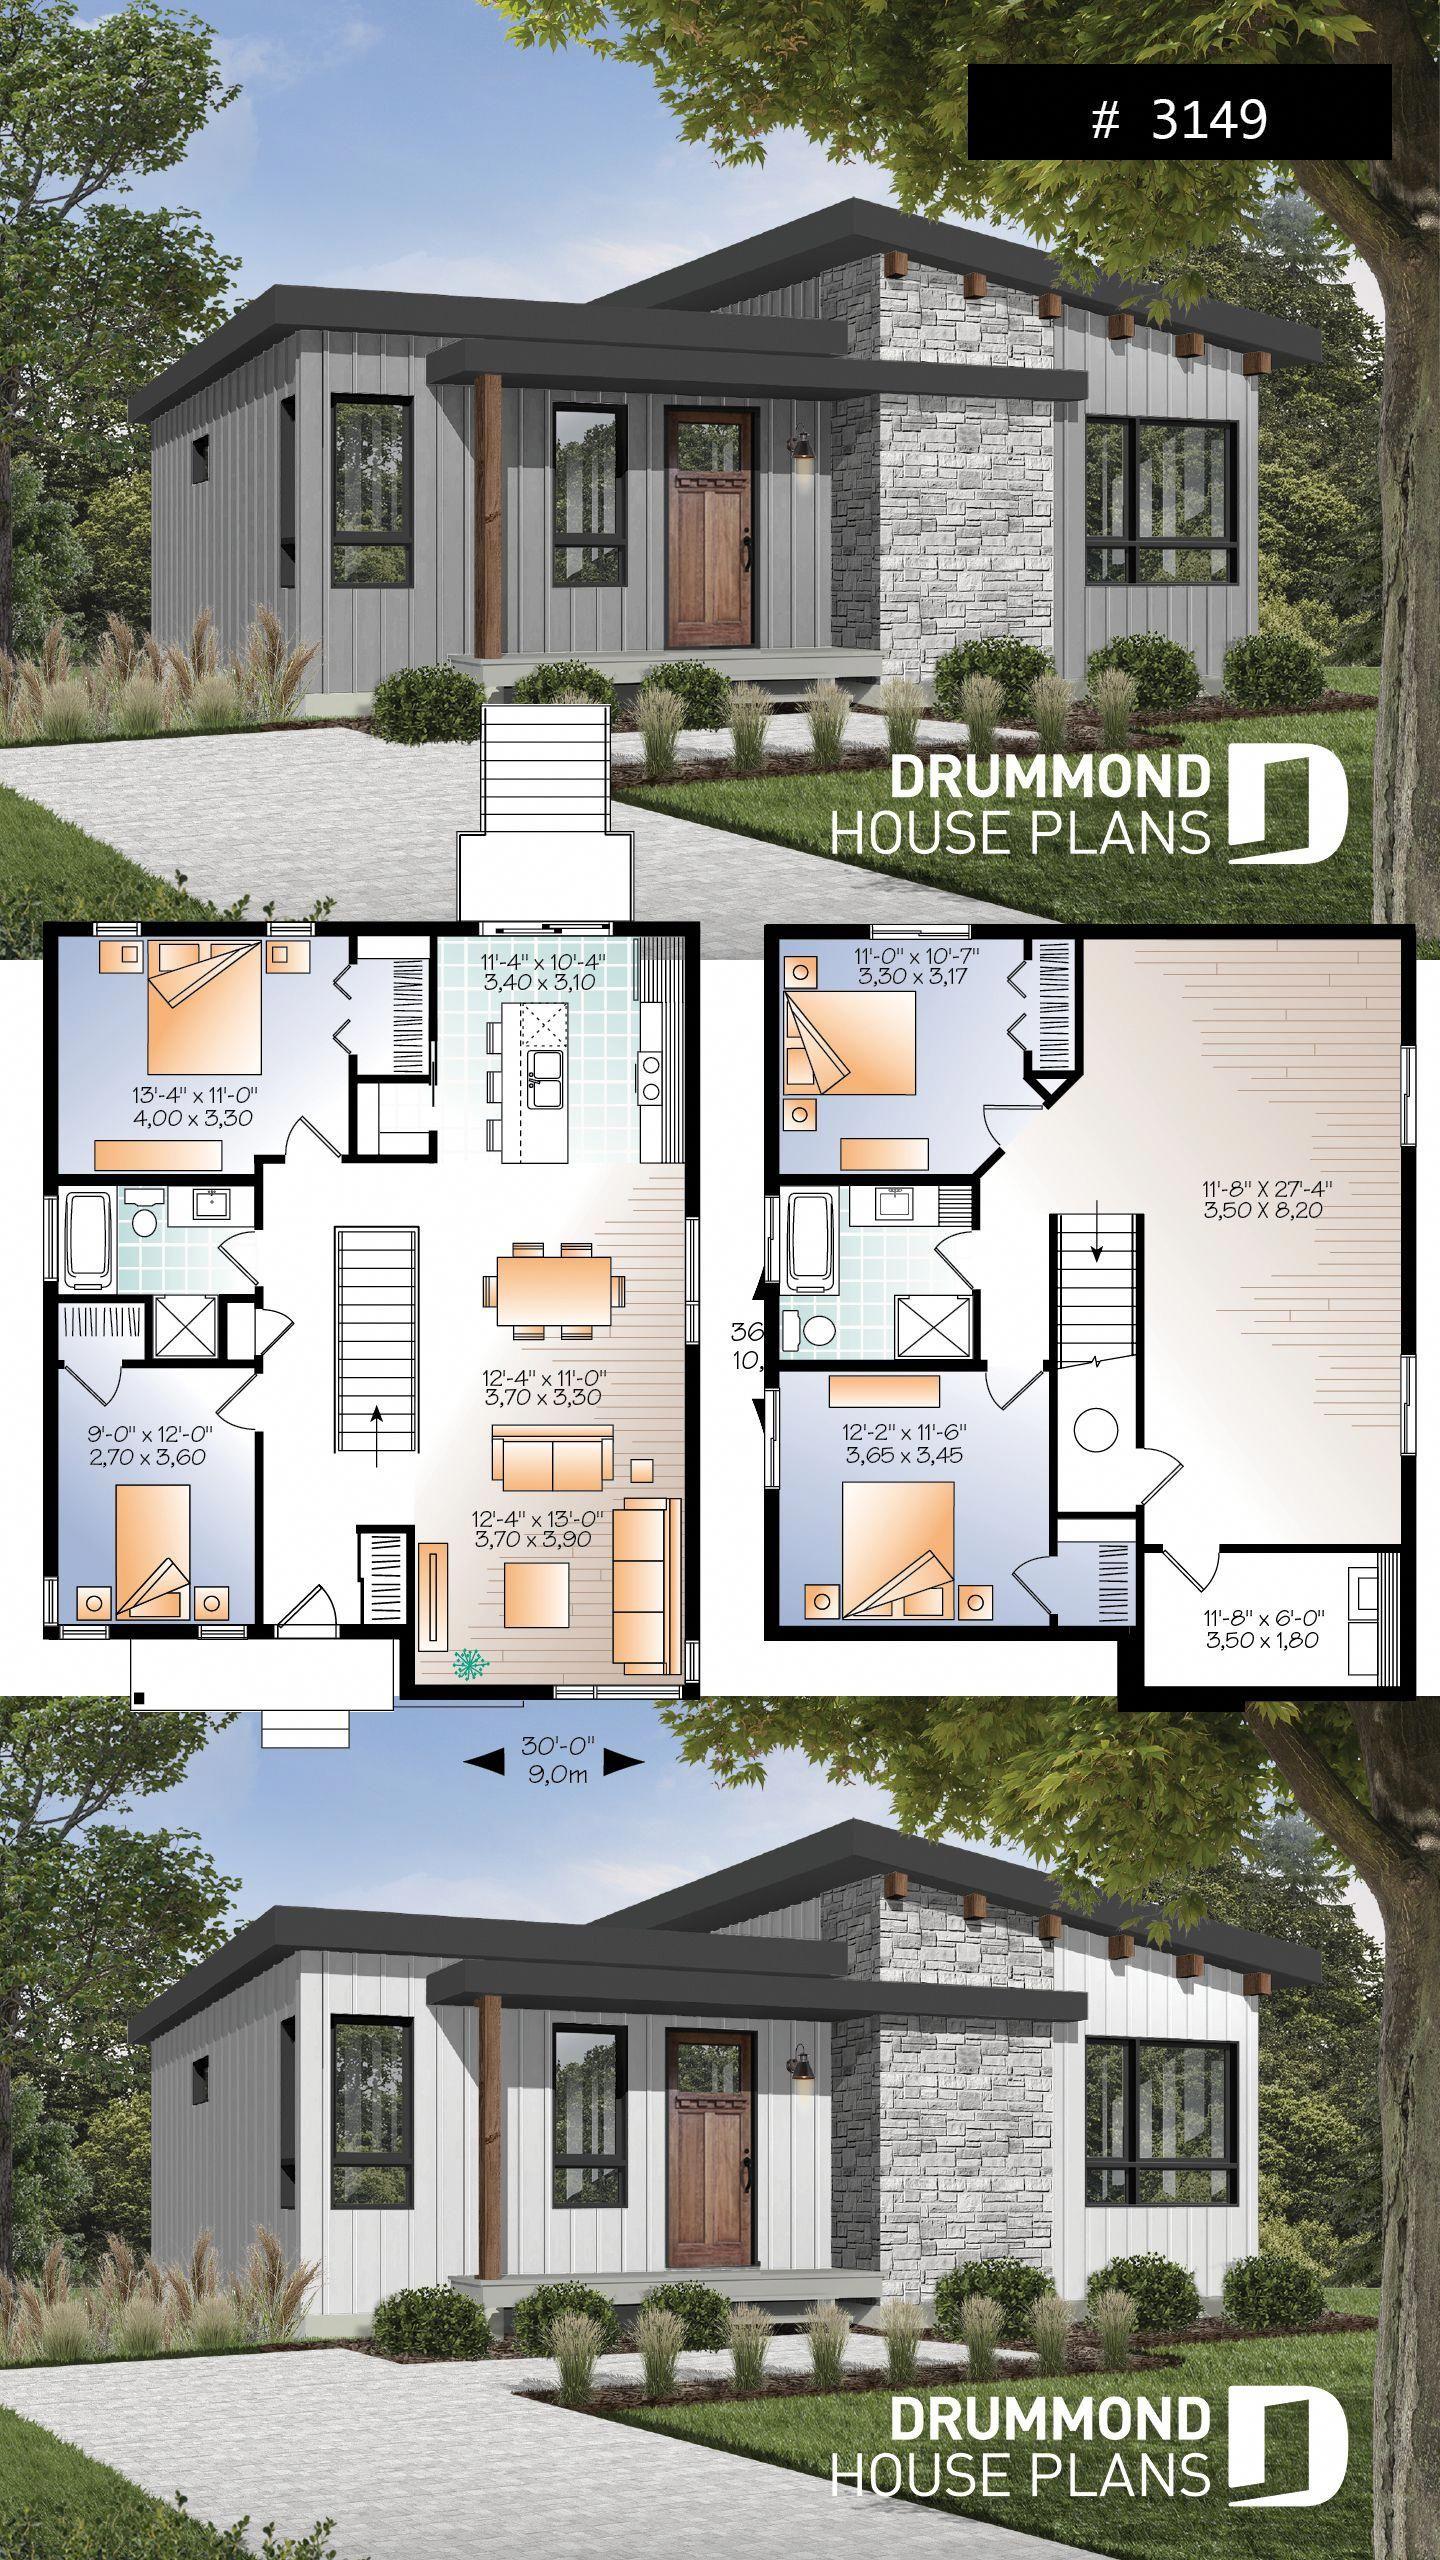 Ideas For Basement Organizations Finishedbasement Basementwalls Basementforless Basementbuiltins Sims House Plans Modern House Plan House Plans